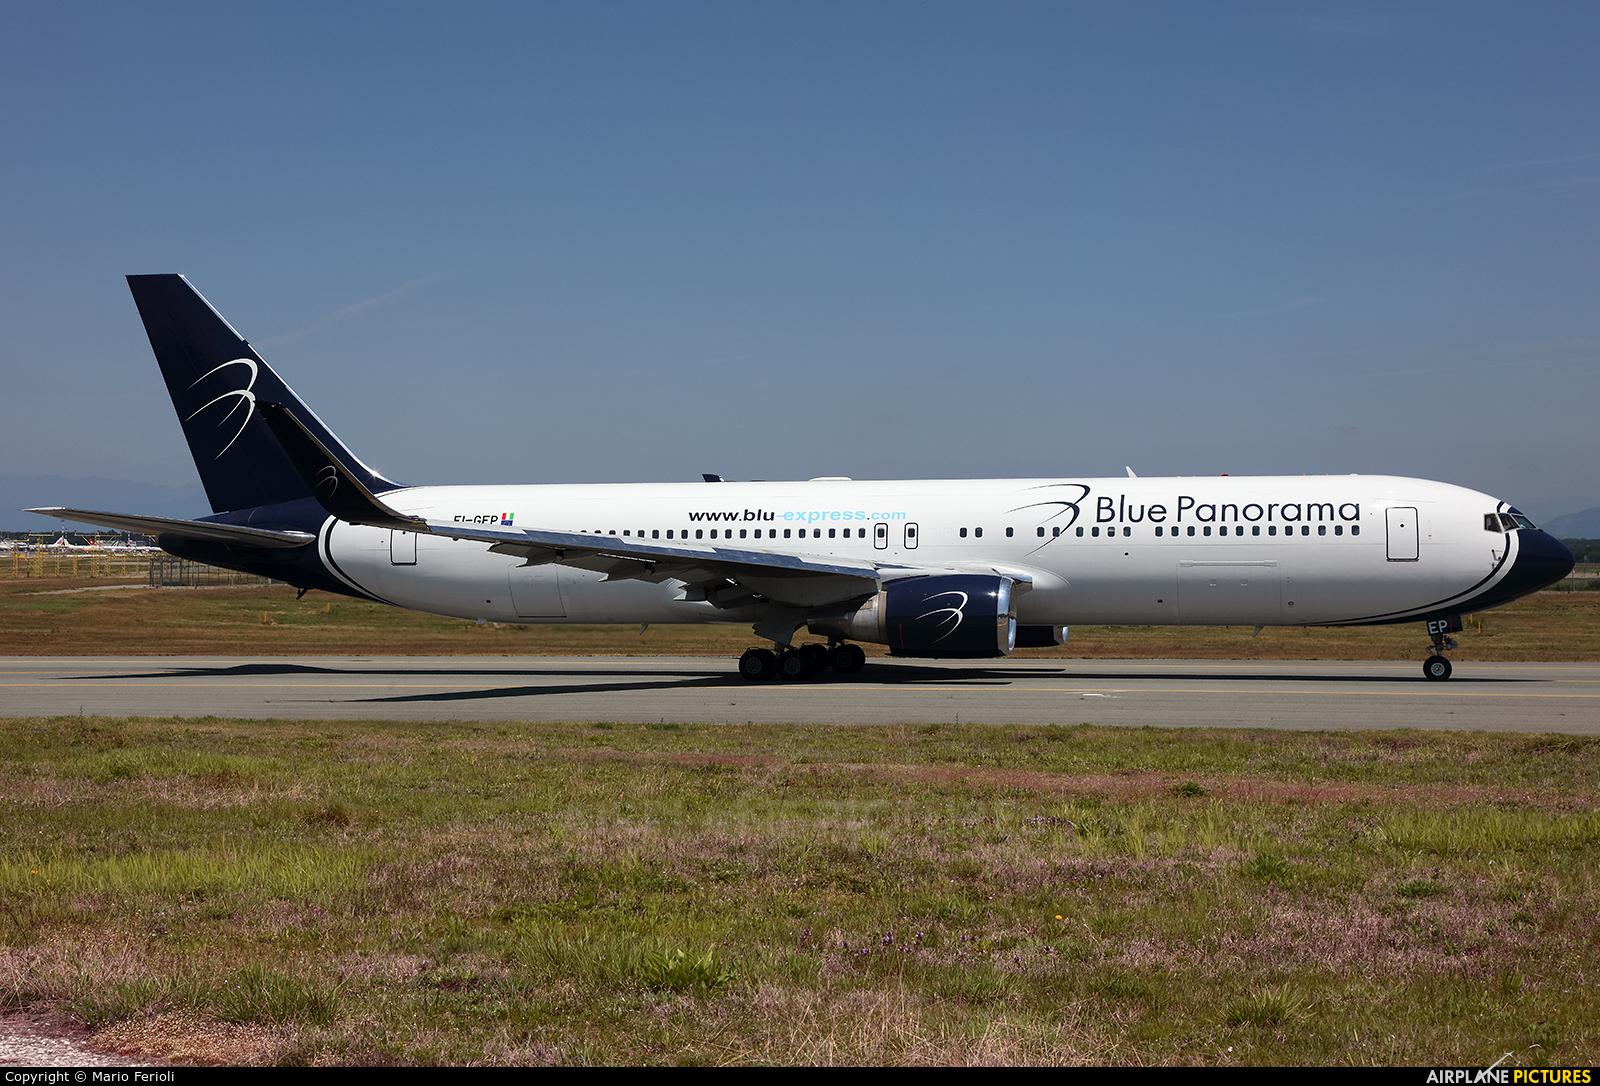 Blue Panorama Airlines EI-GEP aircraft at Milan - Malpensa